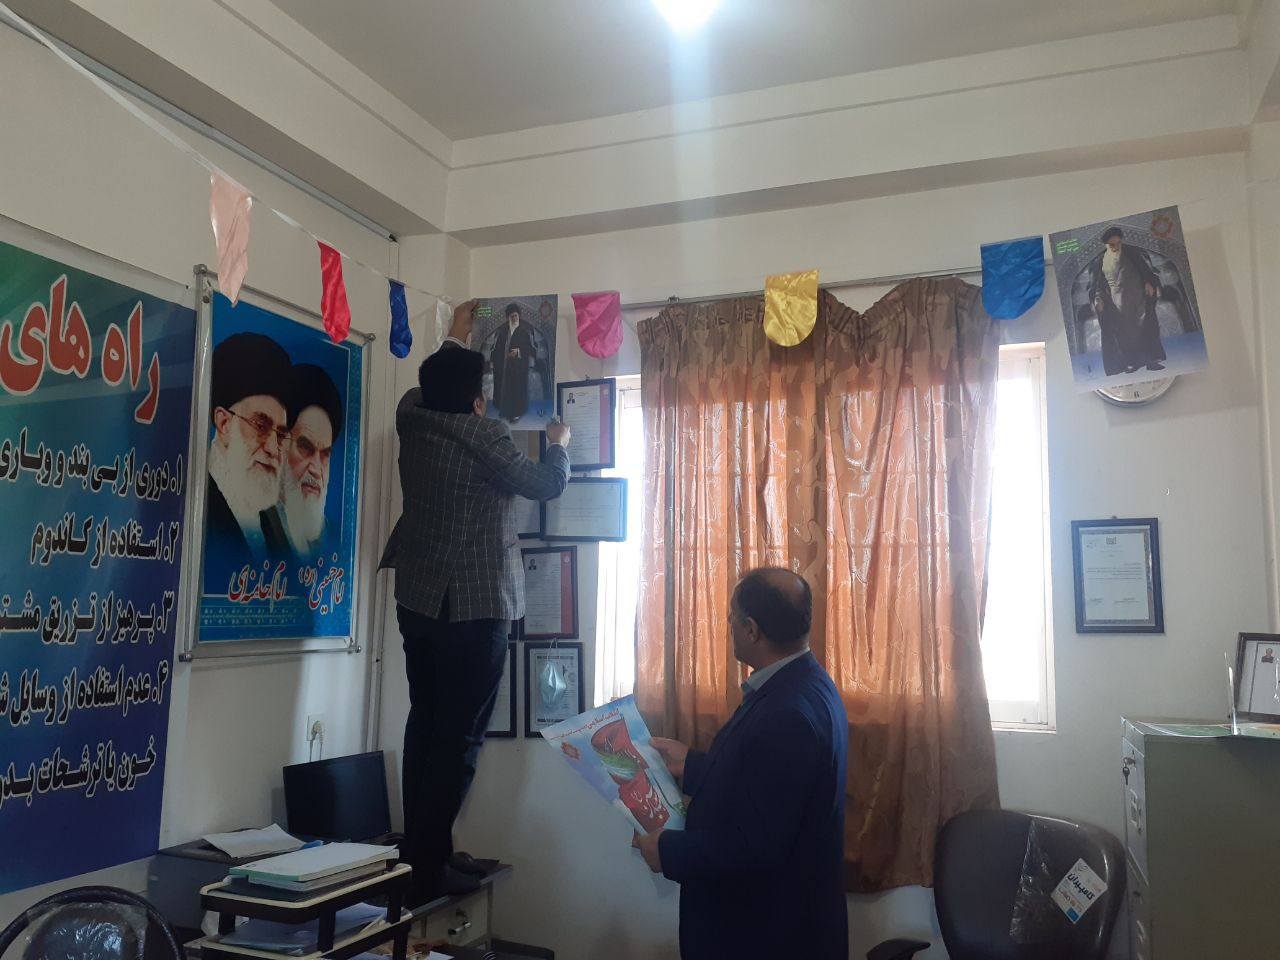 IMG 20210214 110115 098 - تبیین نقش مسجد در حوزه های مختلف در دستور کار فعالیت های کانون امام علی(ع) نکا